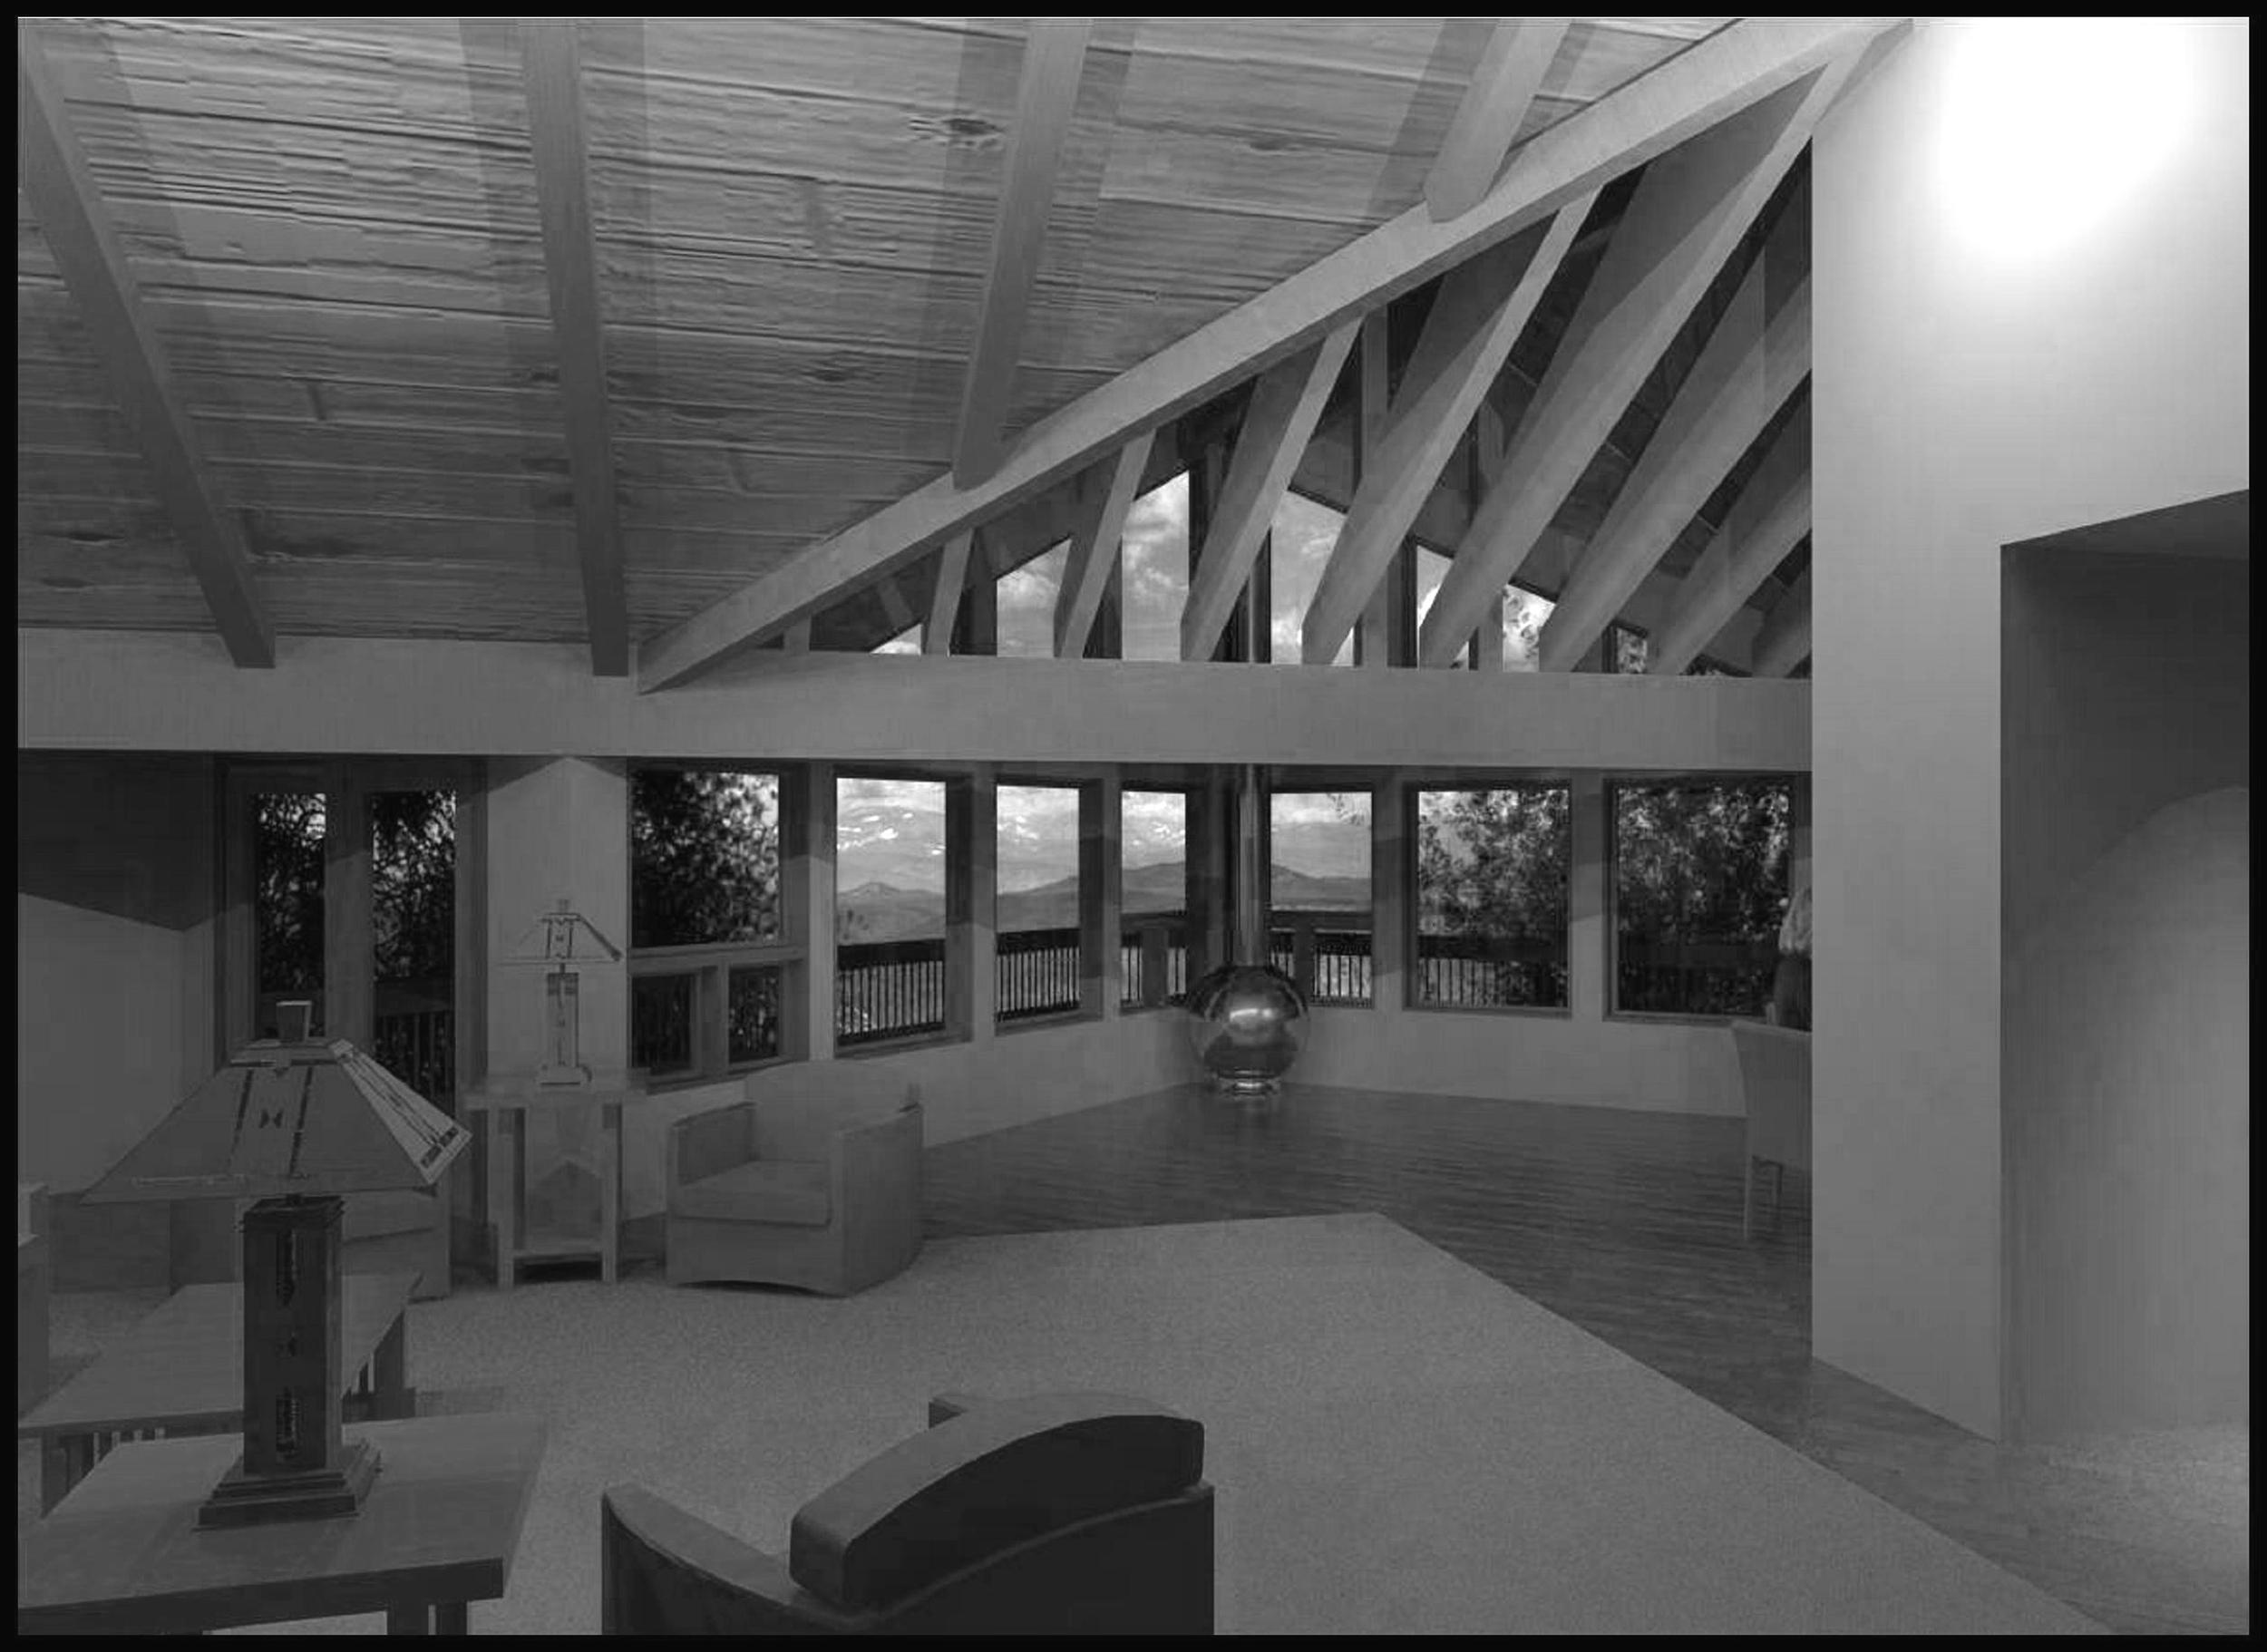 1106_Interior_Rendering_BW.jpg